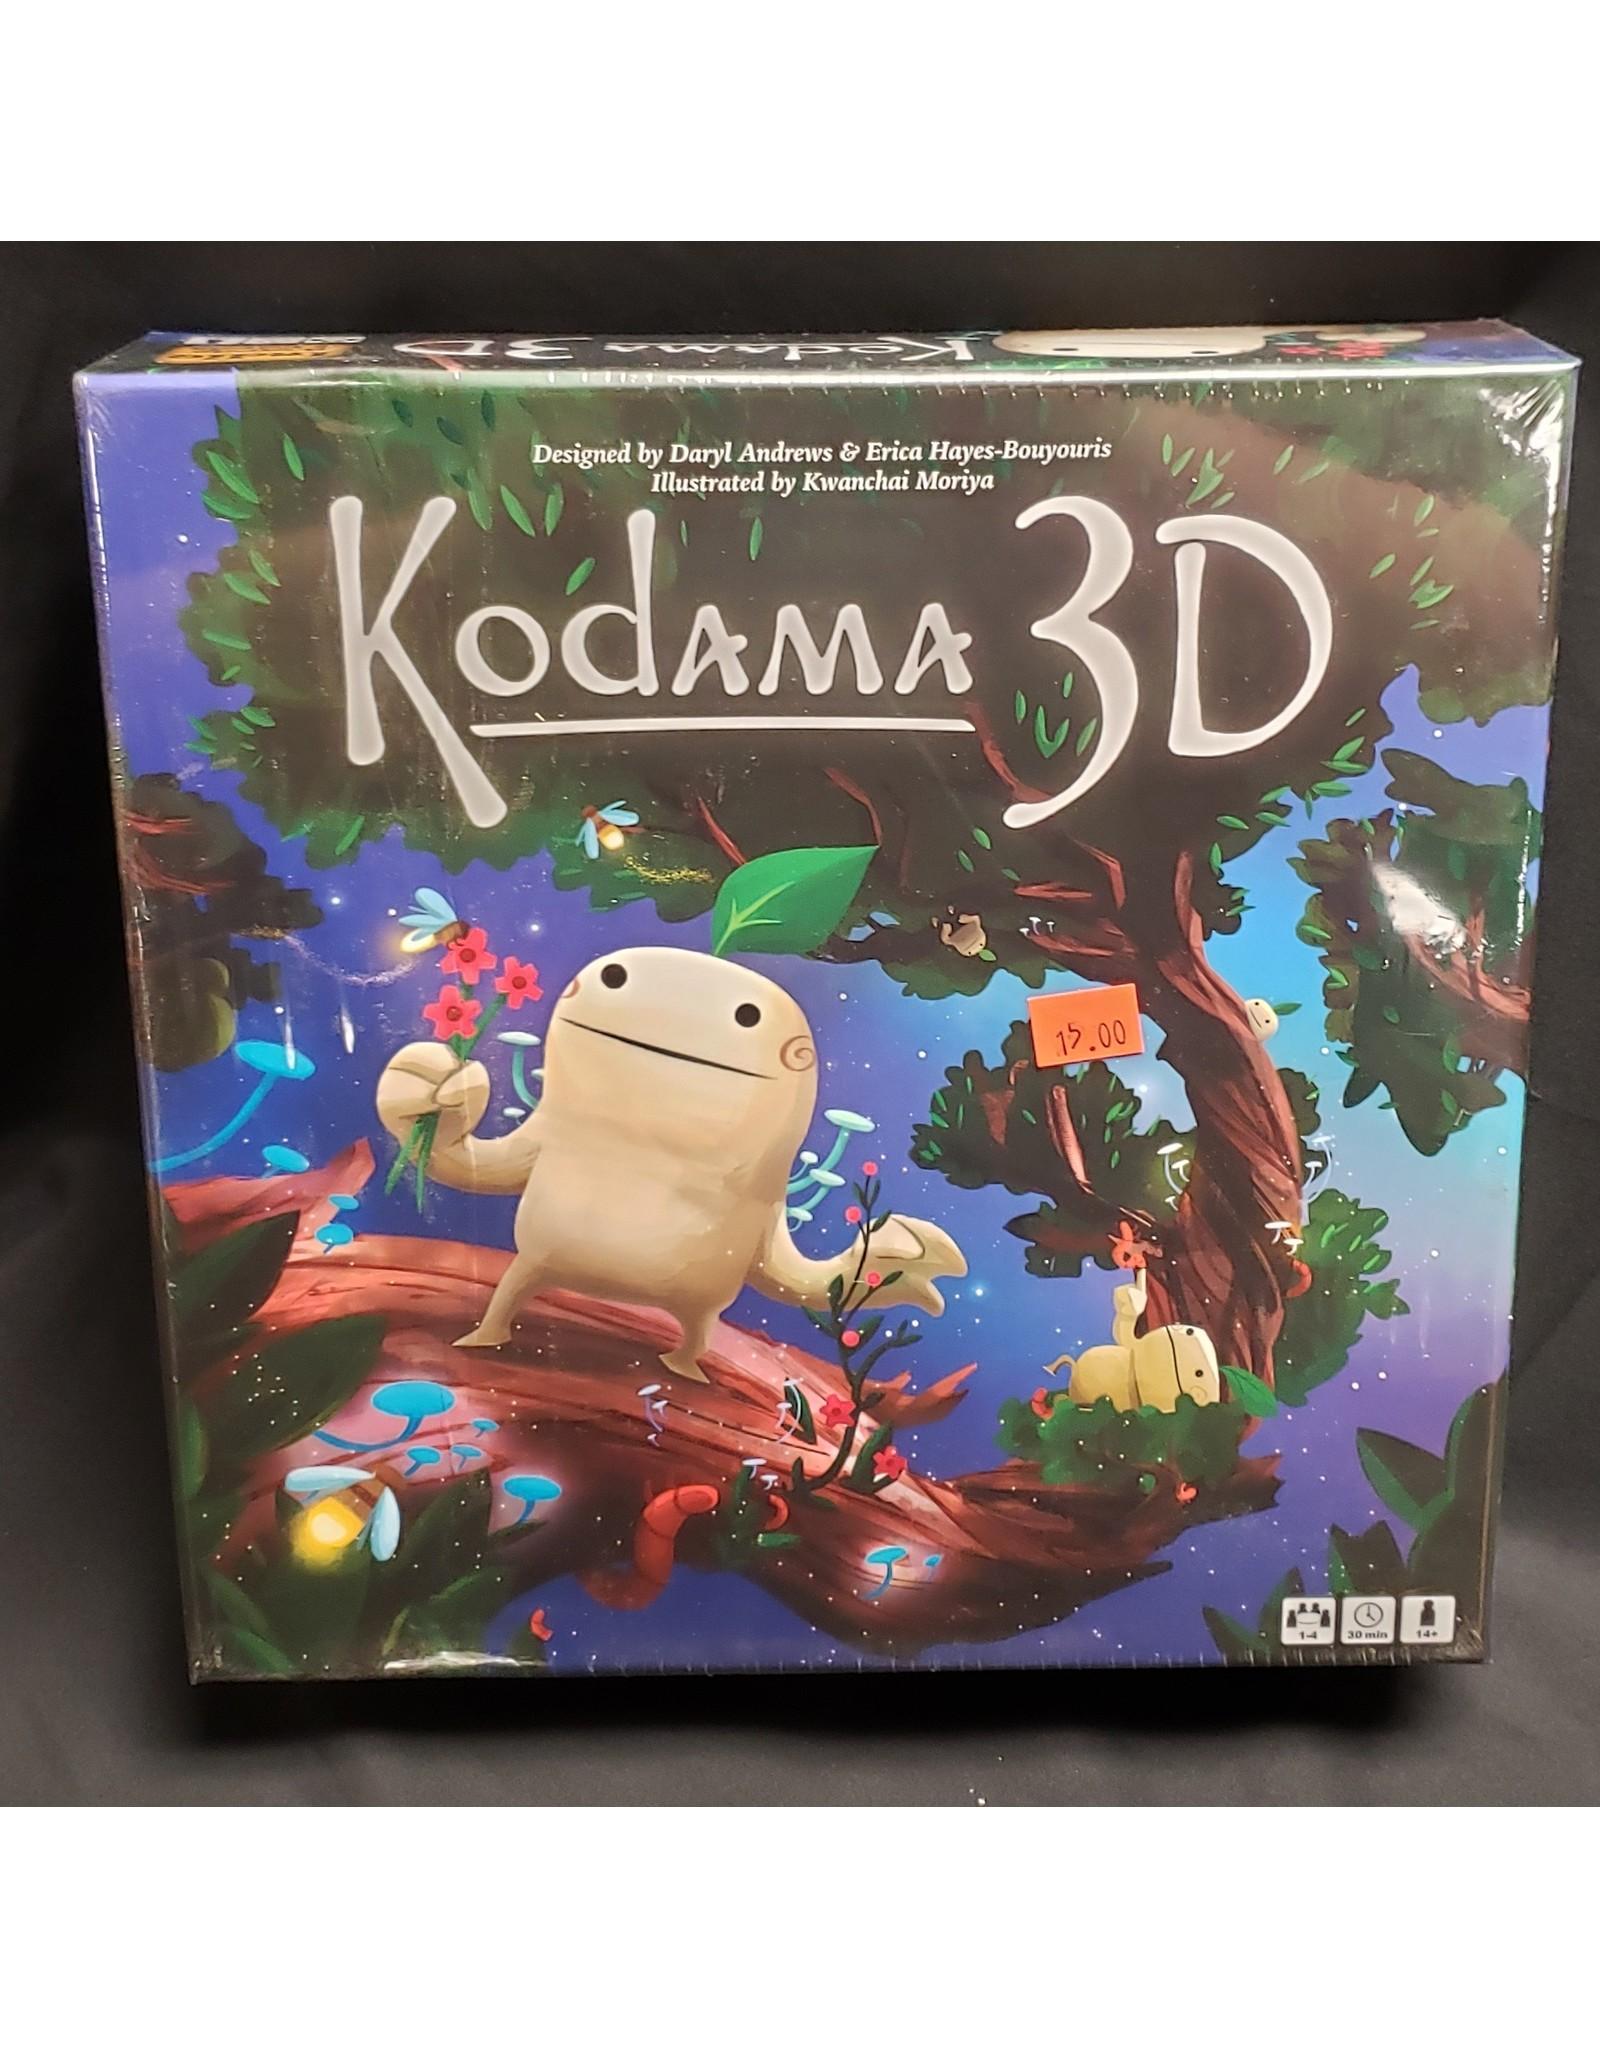 Ding & Dent Kodama 3D (Ding & Dent)